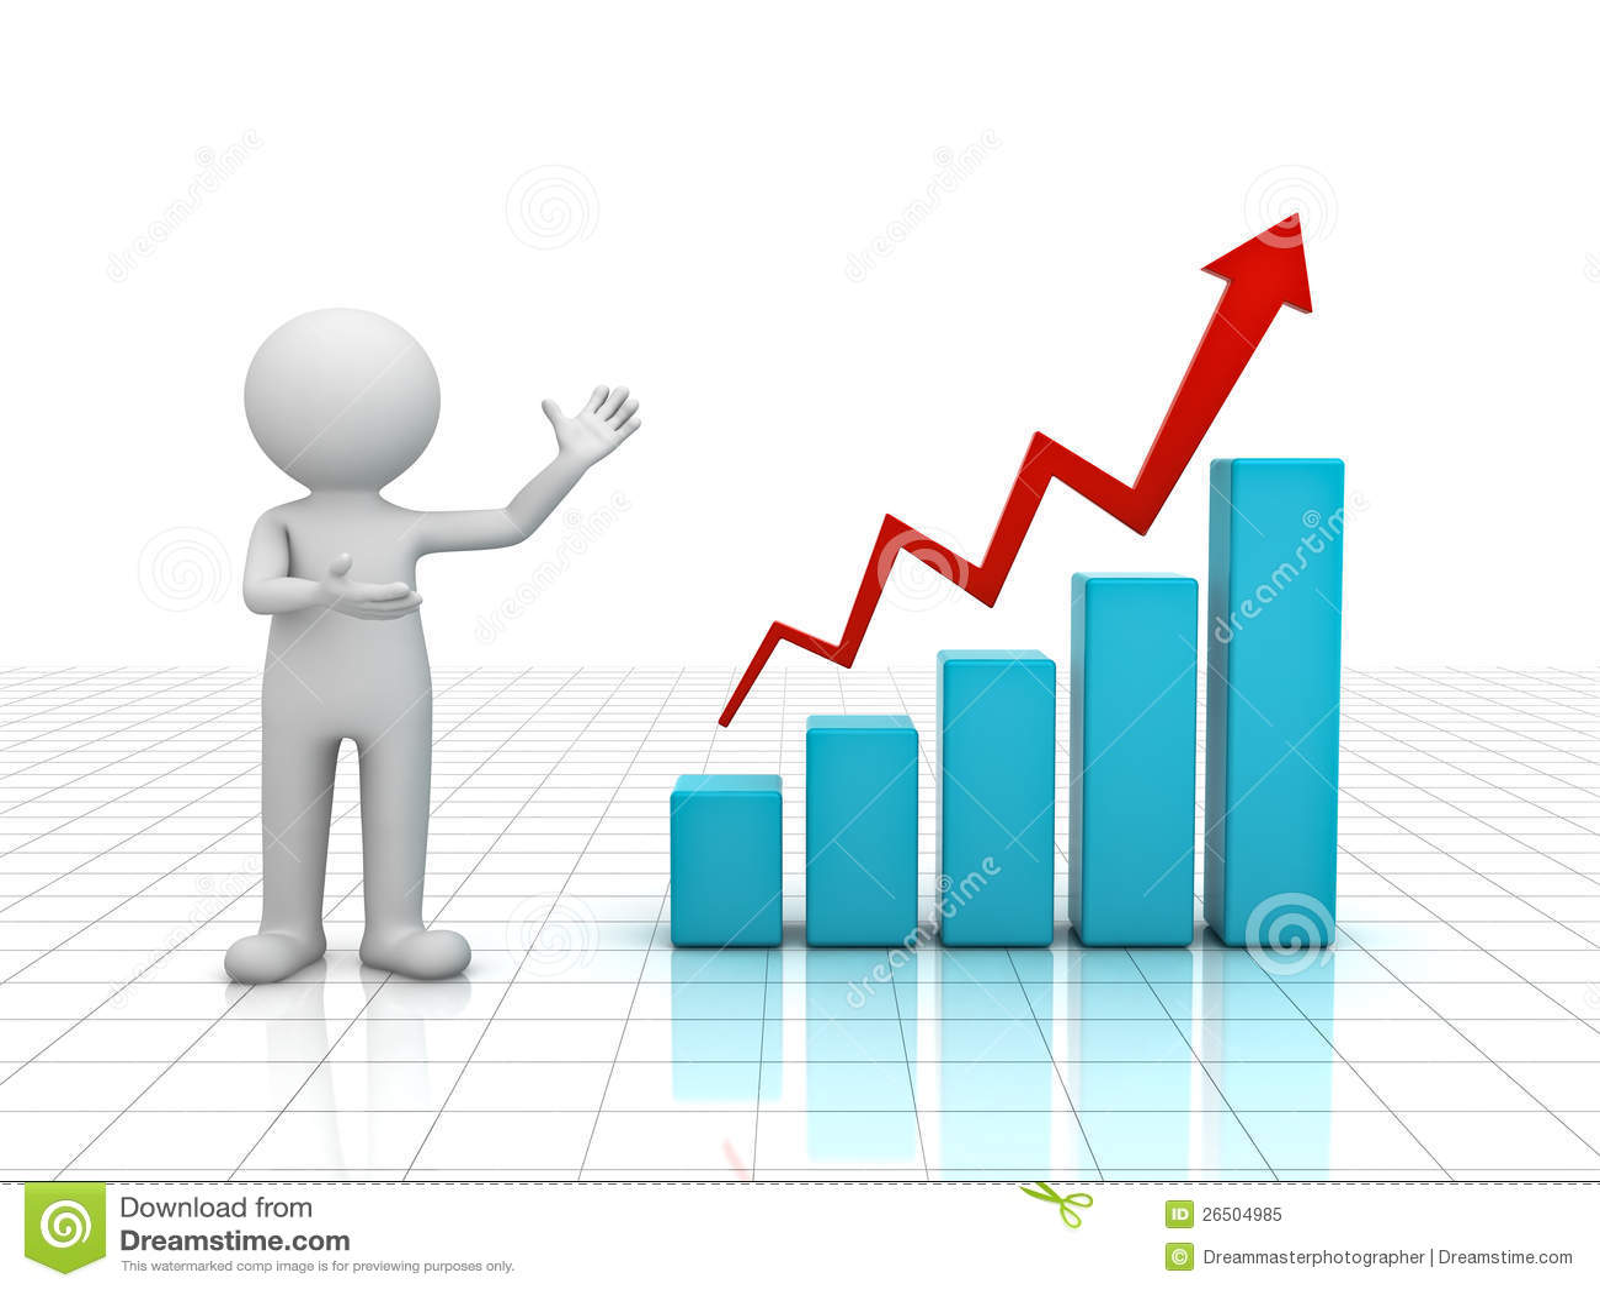 business growth chart Business Growth Chart